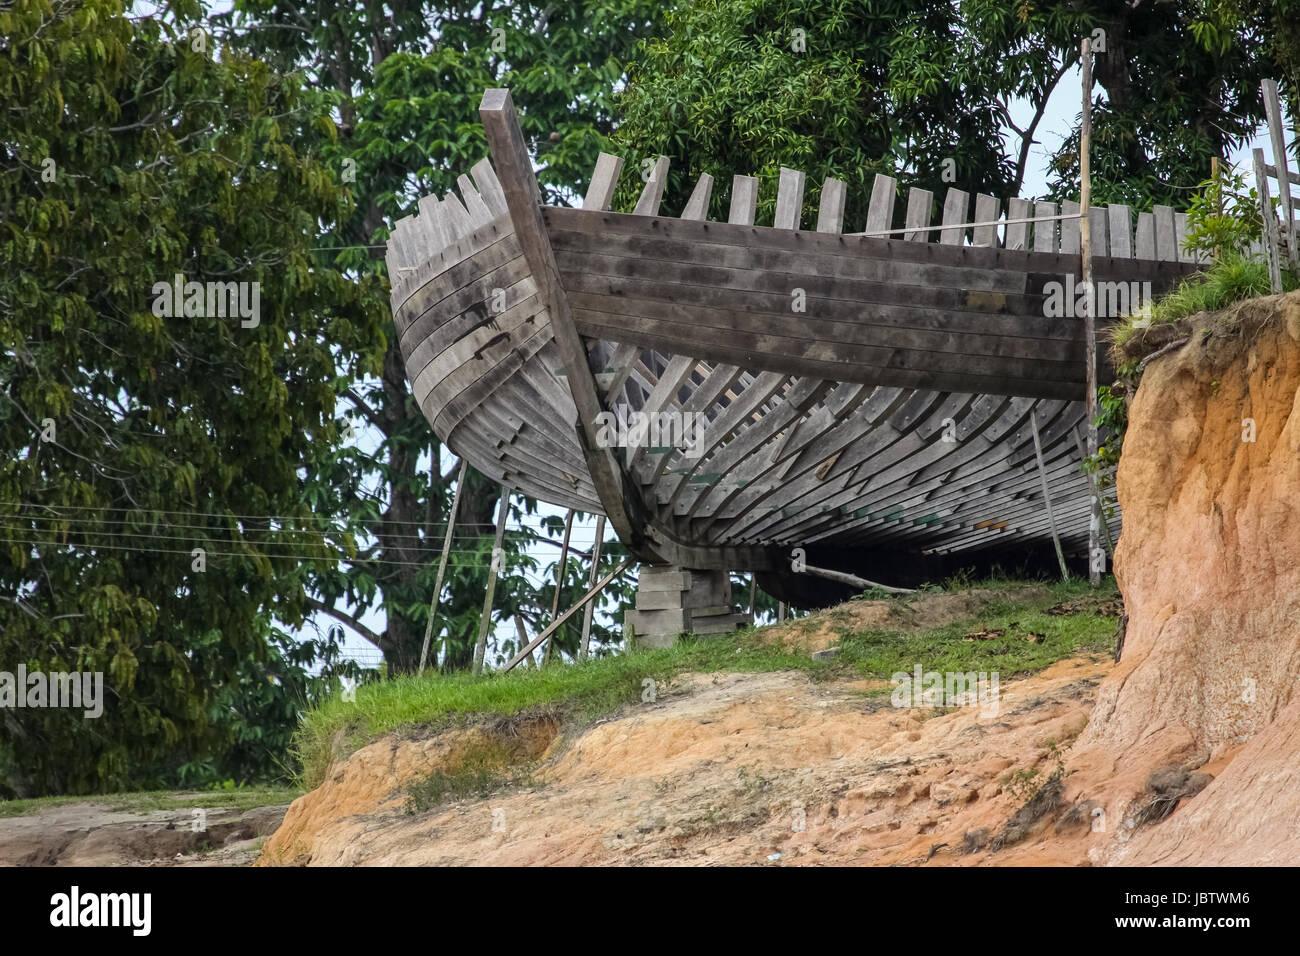 Amazon boat builders Yard, Rio Negro, Brazil - Stock Image